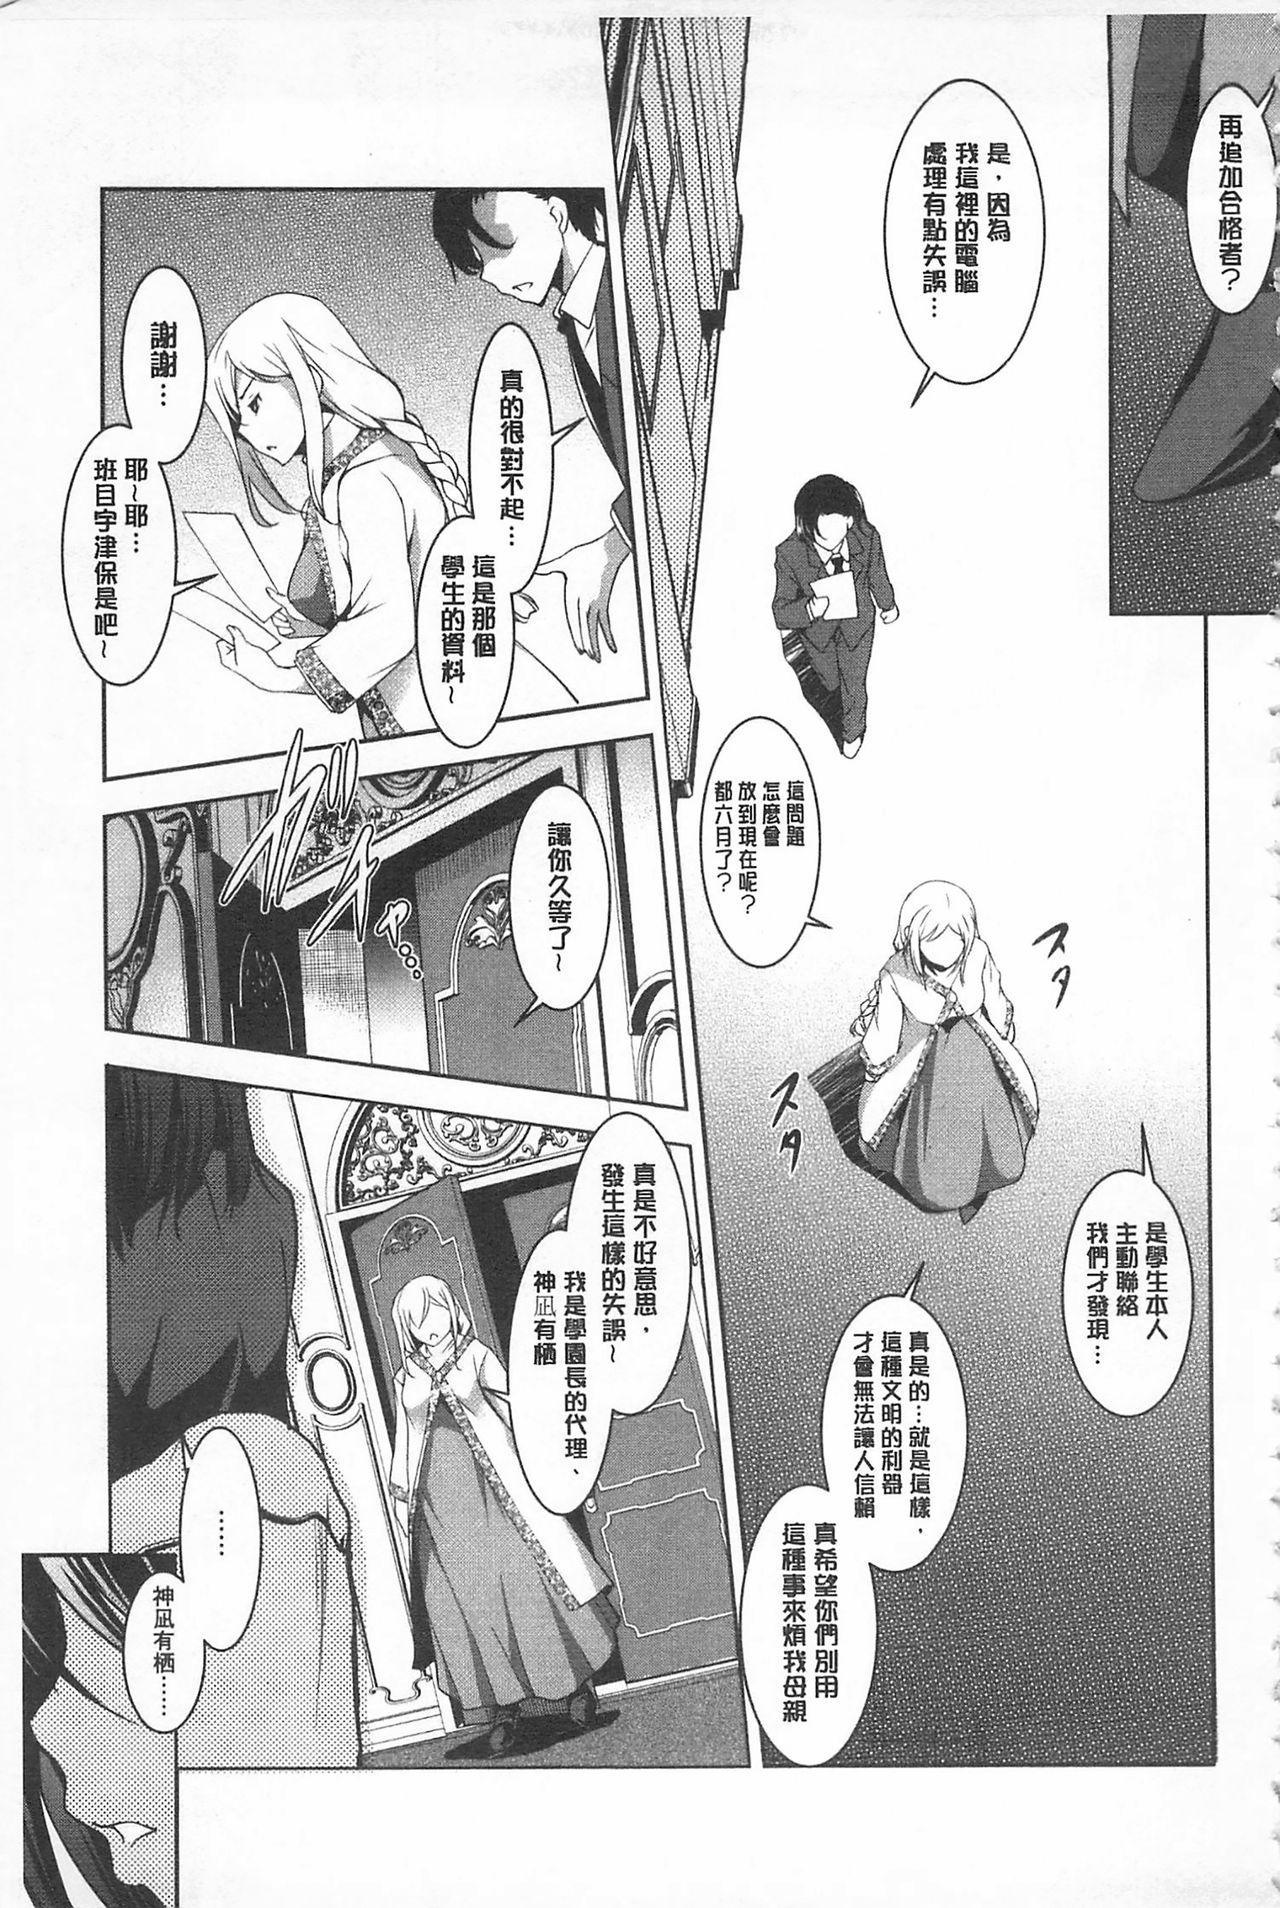 [Amano Kazumi] Seida Inyou -Seijo no Katachi Shita Intou- | 聖墮陰陽 -聖女的容貌與淫蕩- [Chinese] 18